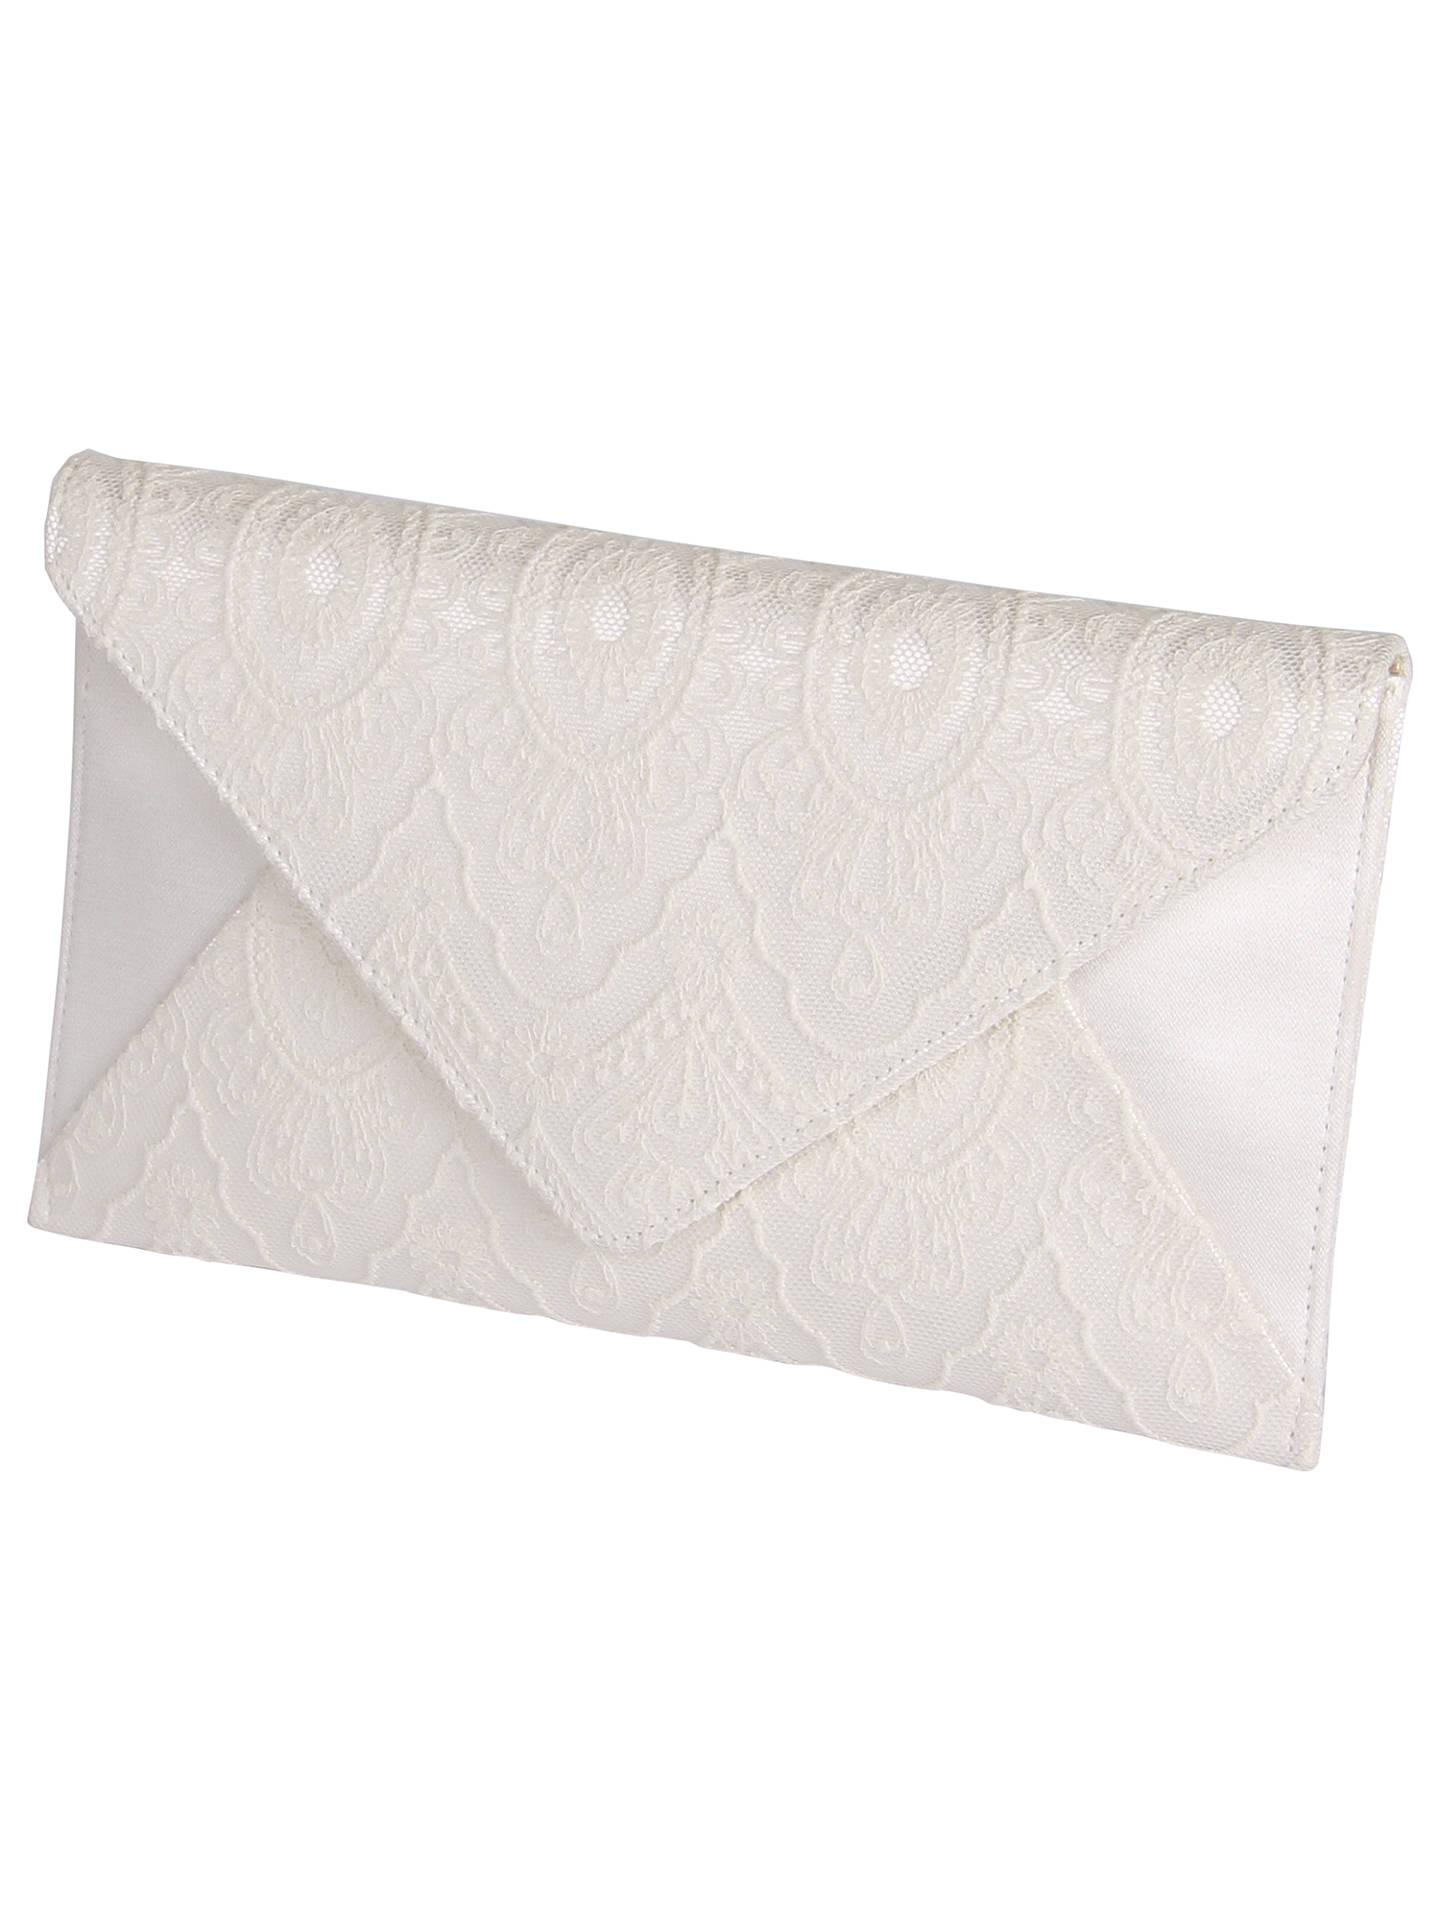 d738e47f4e3 Buy Rainbow Club Lisette Lace Envelope Clutch Bag, Ivory Online at  johnlewis.com